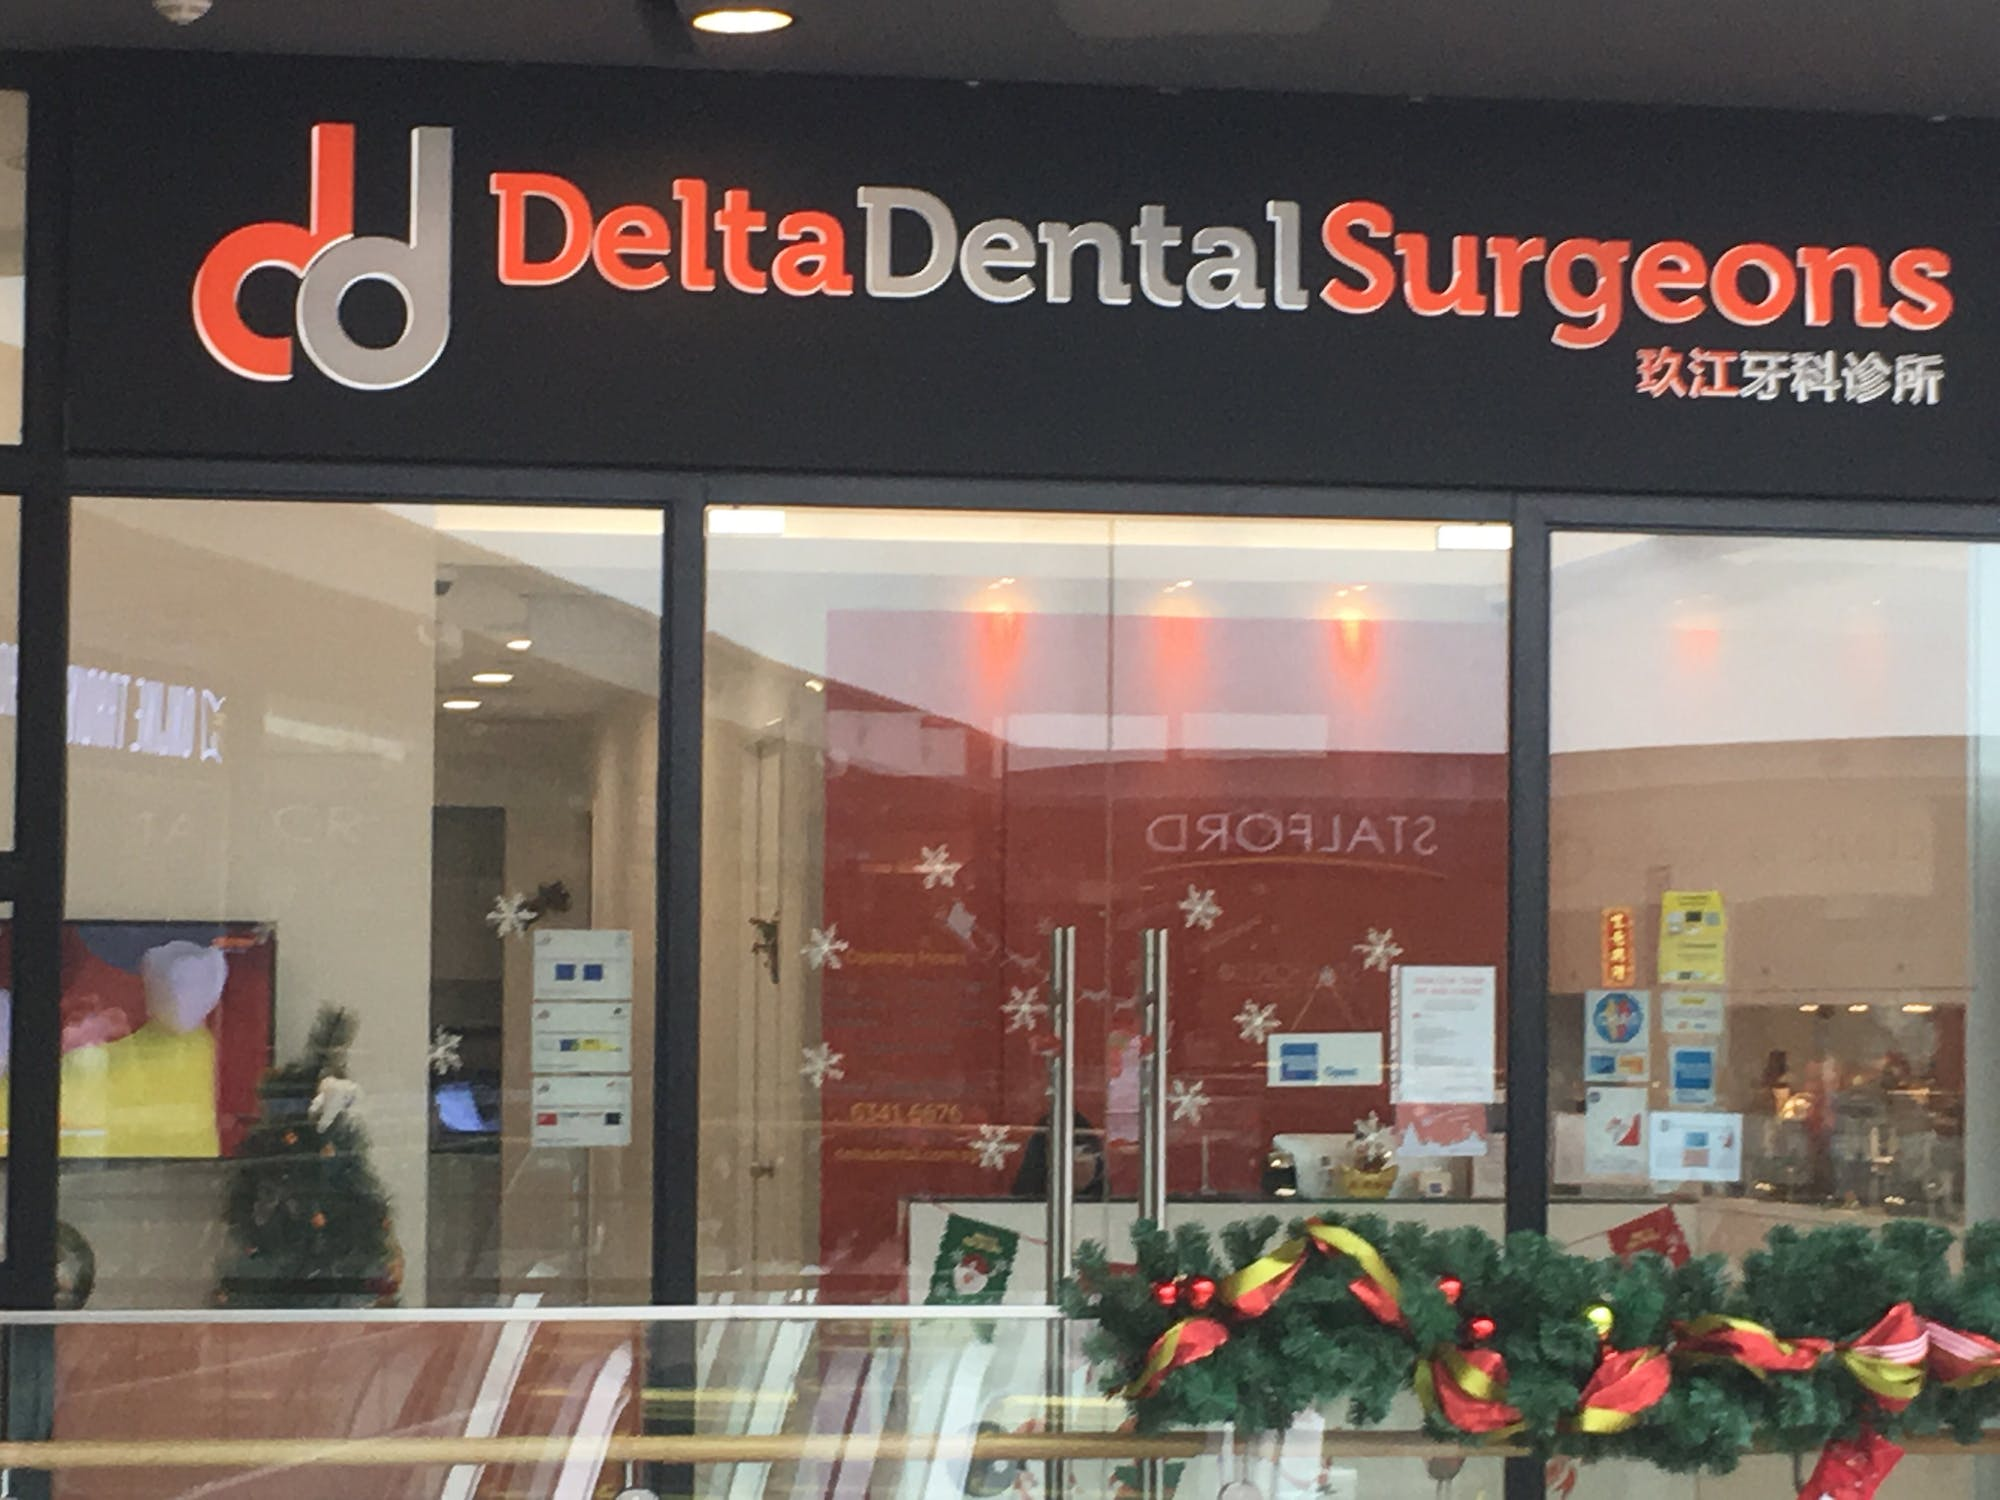 Delta Dental Surgeons